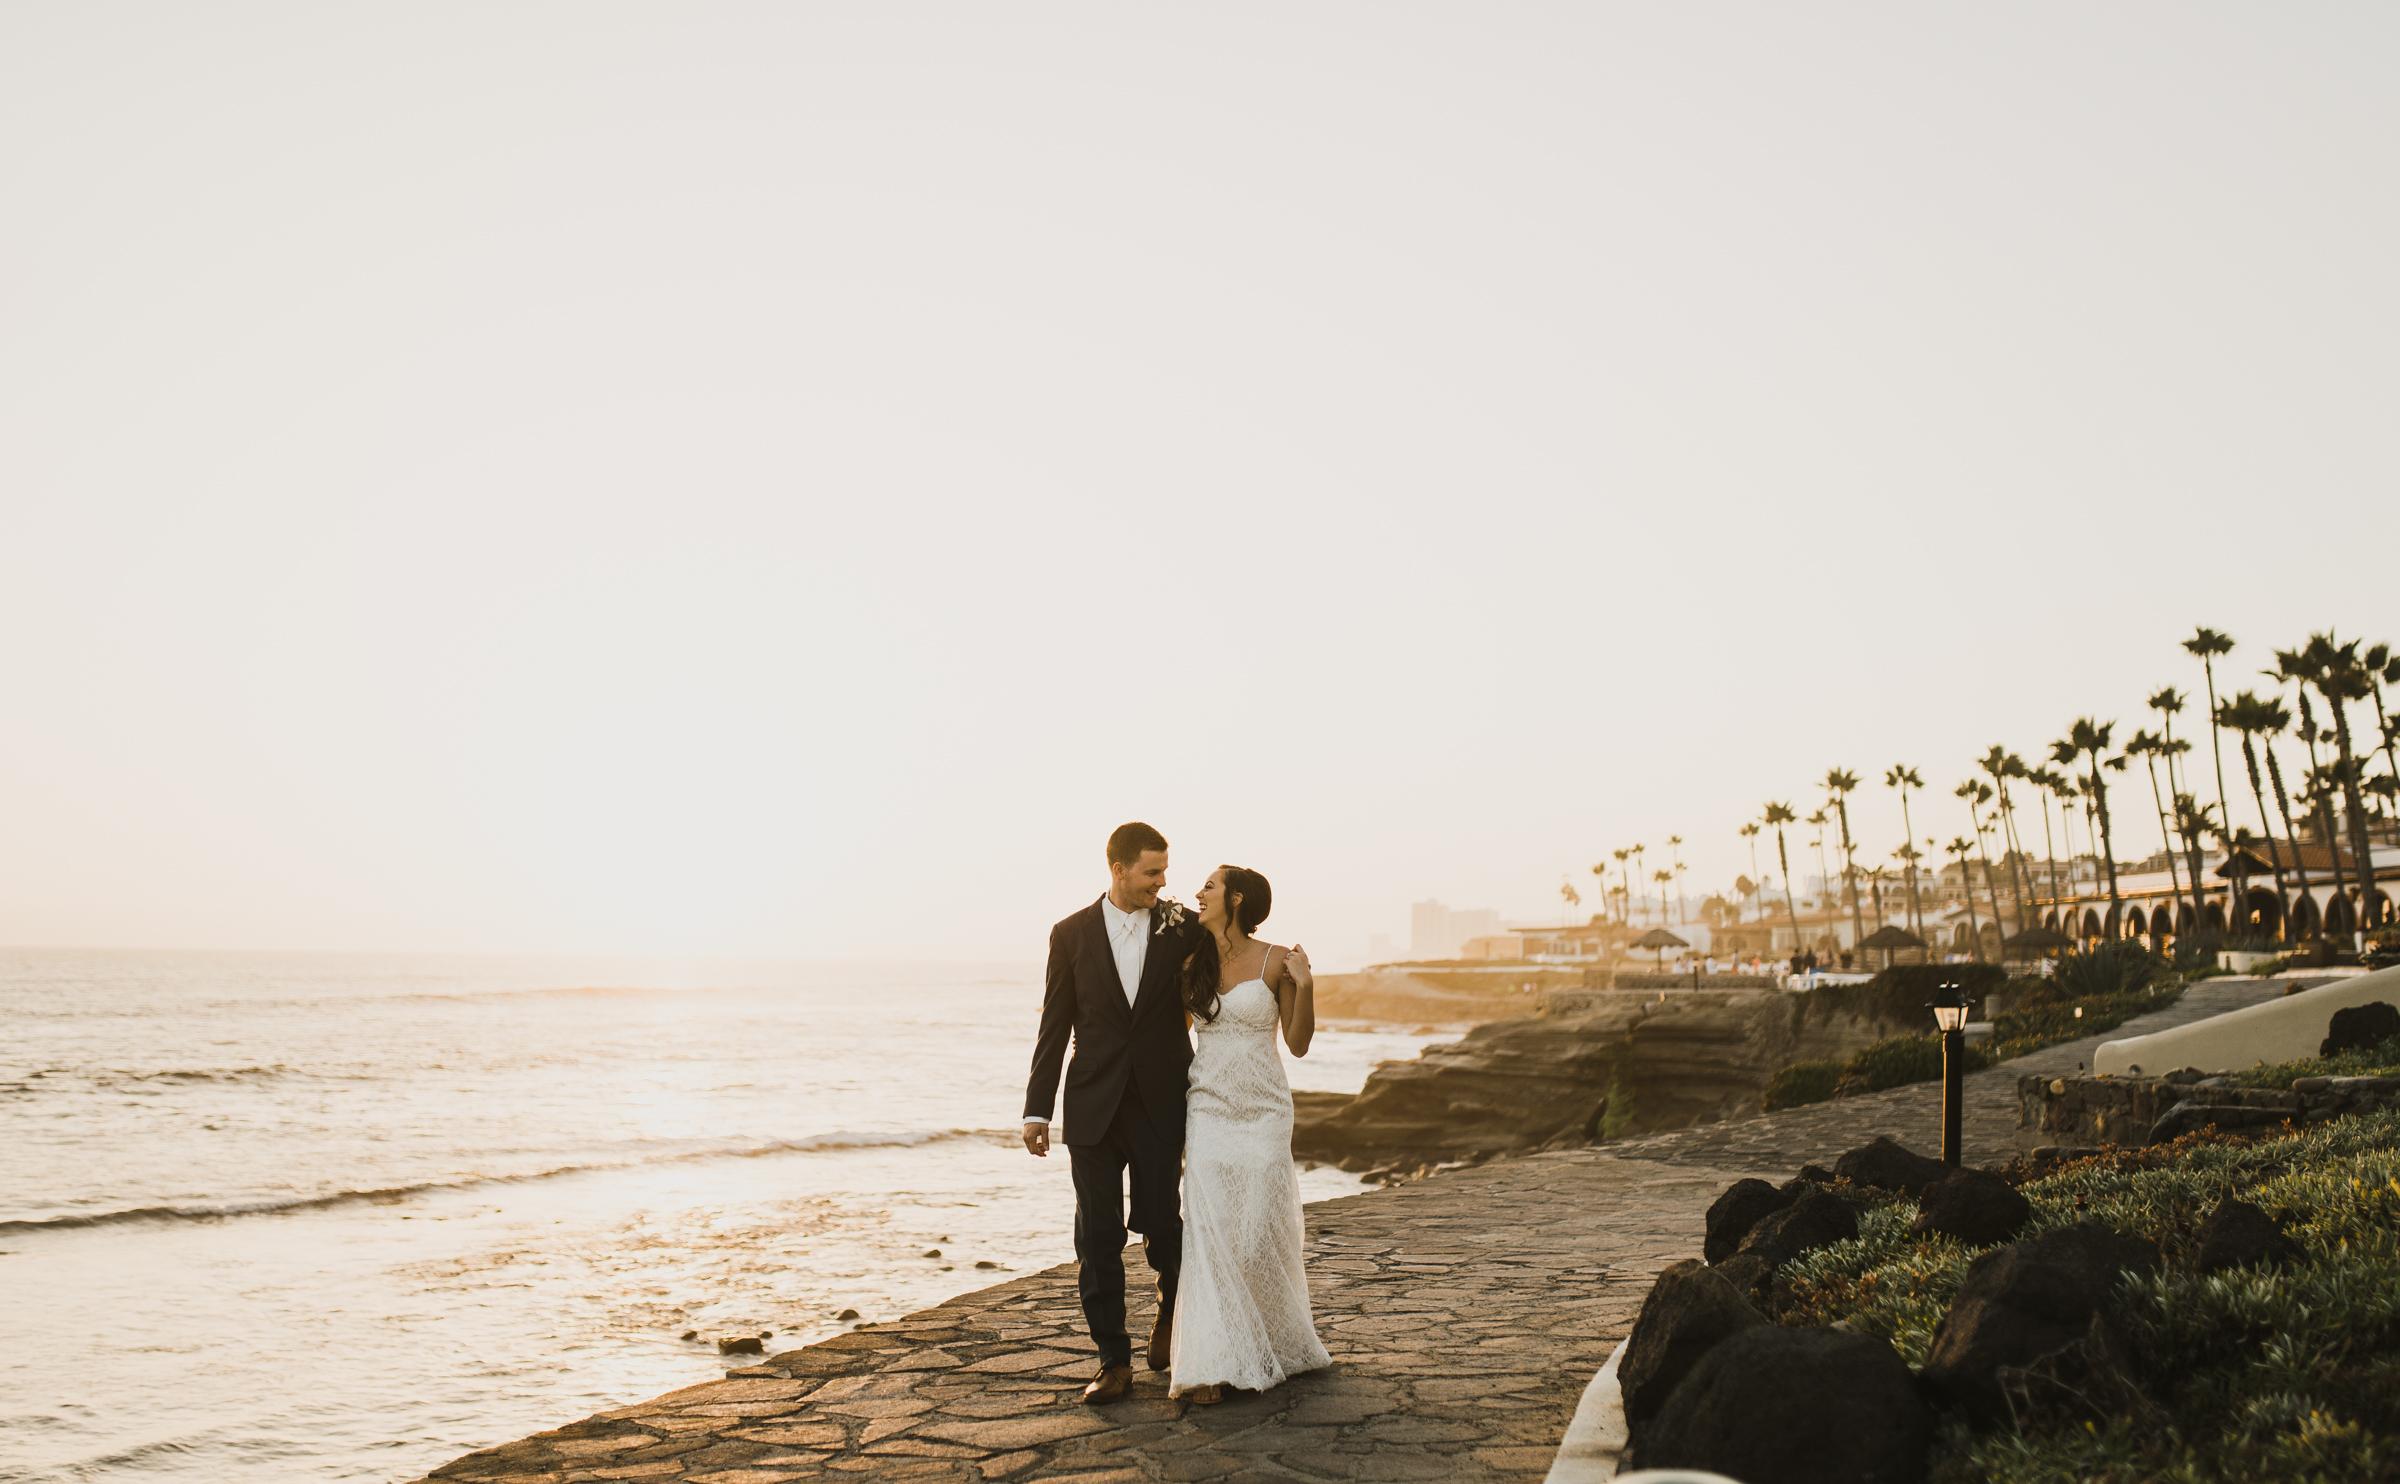 ©Isaiah + Taylor Photography - Rosarito Beach Destination Wedding, Mexico-0088.jpg